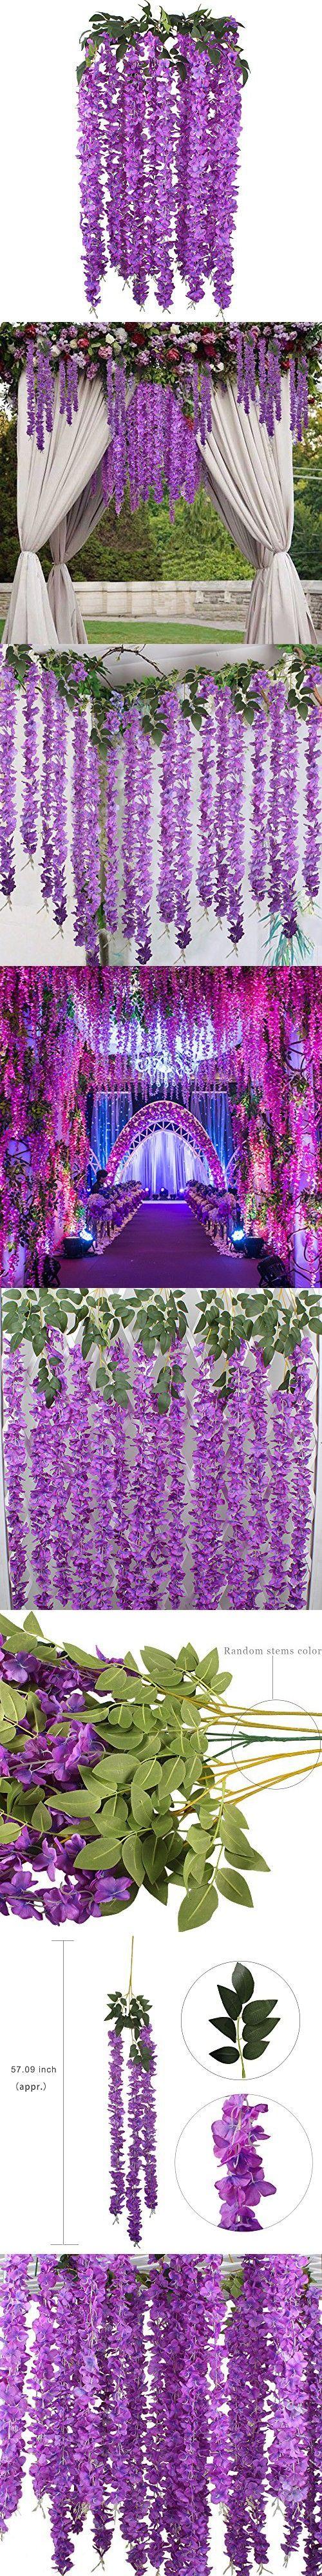 GTidea 5pcs Silk Wisteria Flowers Hanging Vine Rattan Artificial Plant Garland Wreath Wholesale Home Garden Fences Restrant Hotel Parties Wedding Simulation Decor in Purple